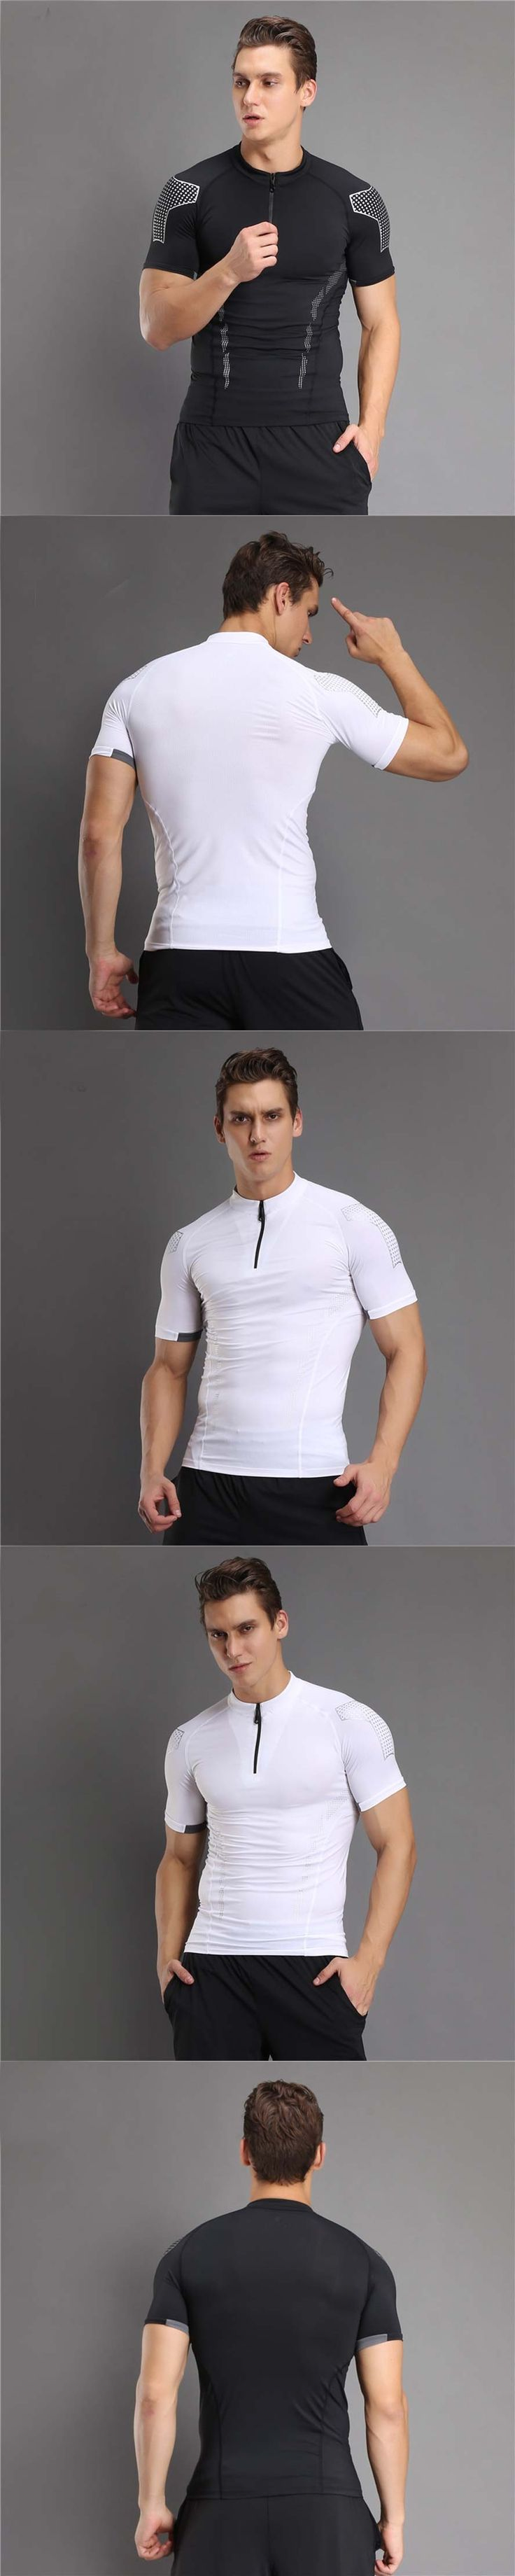 Hot Sale Fashion Solid o-Neck Men's T Shirt 2017 Summer Short Sleeve Casual T-Shirt Men Cotton Slim Fit Mens Top Tees Shirt